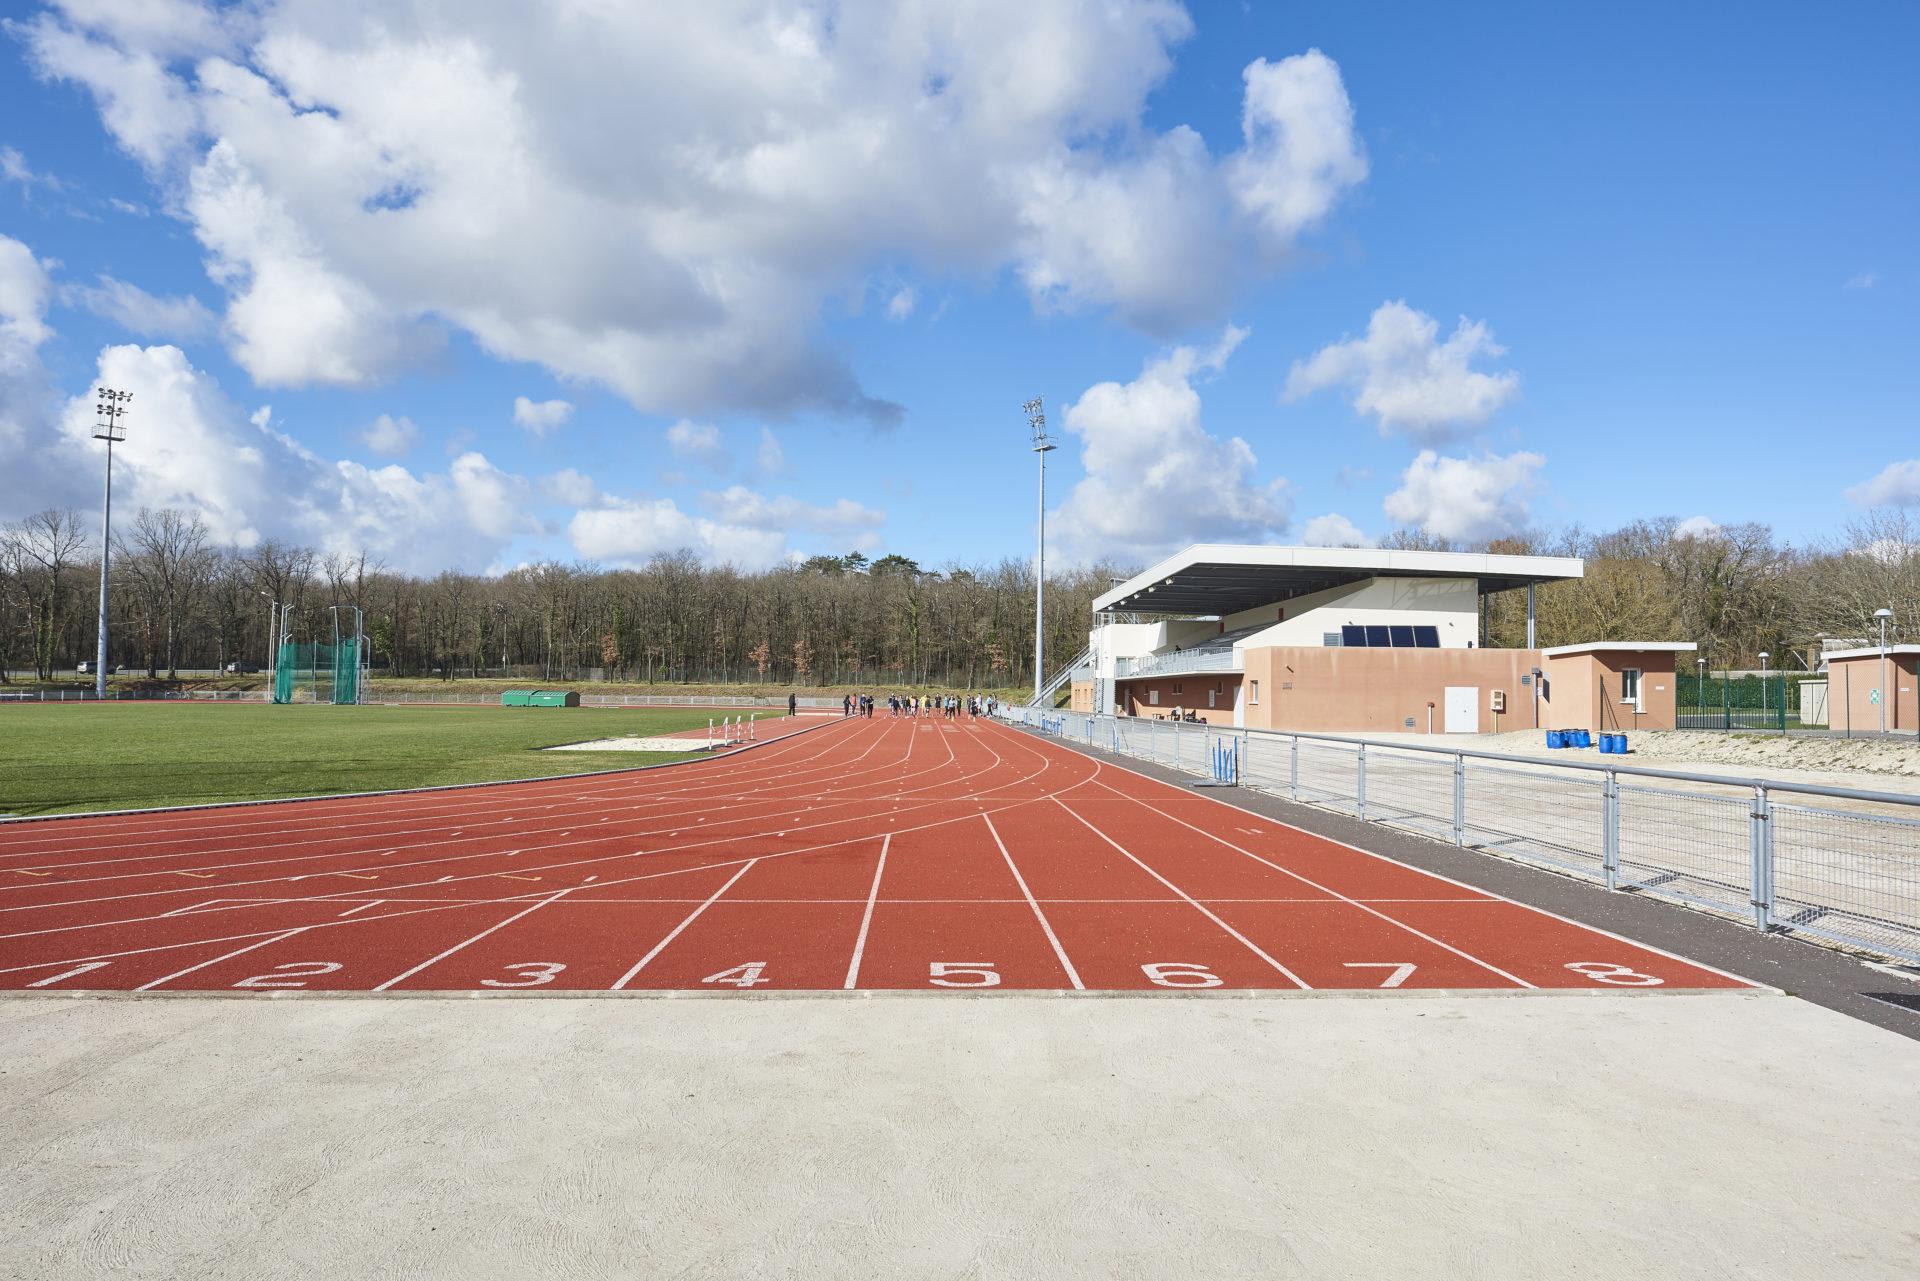 Stade d'athlétisme à Angoulême (16)